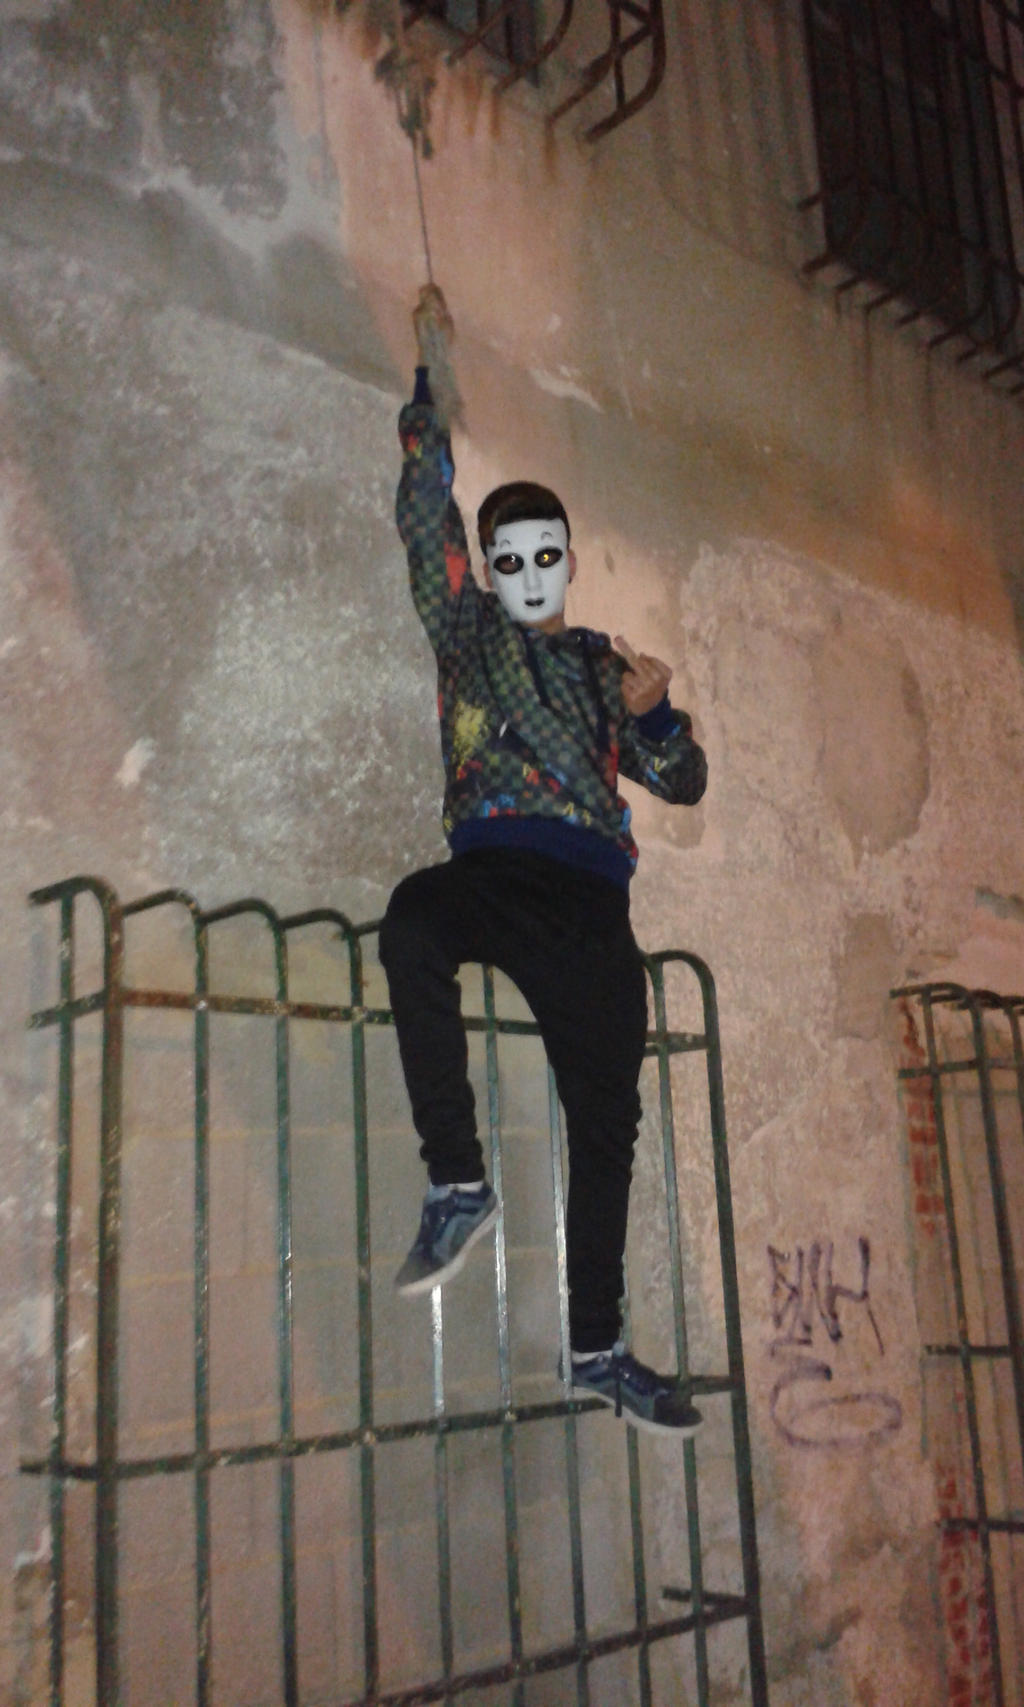 essay hooliganism vandalism and malicious mischief